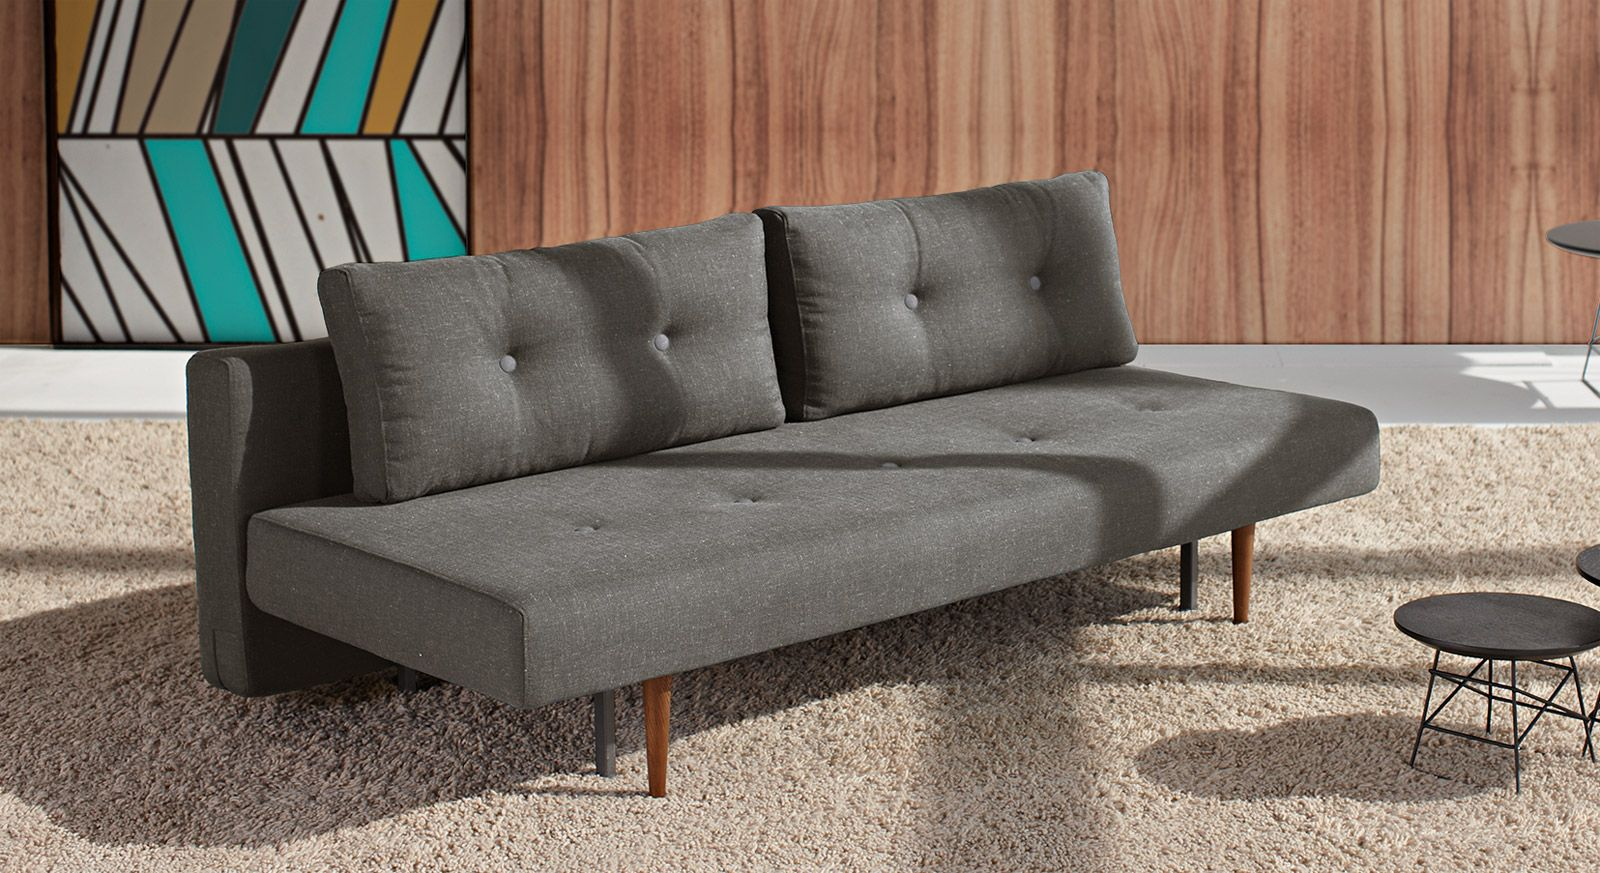 Querschlafer Schlafsofa Im Retrostil In Grau Oder Blau Barnes Sofa Bed Sofa Design Furniture